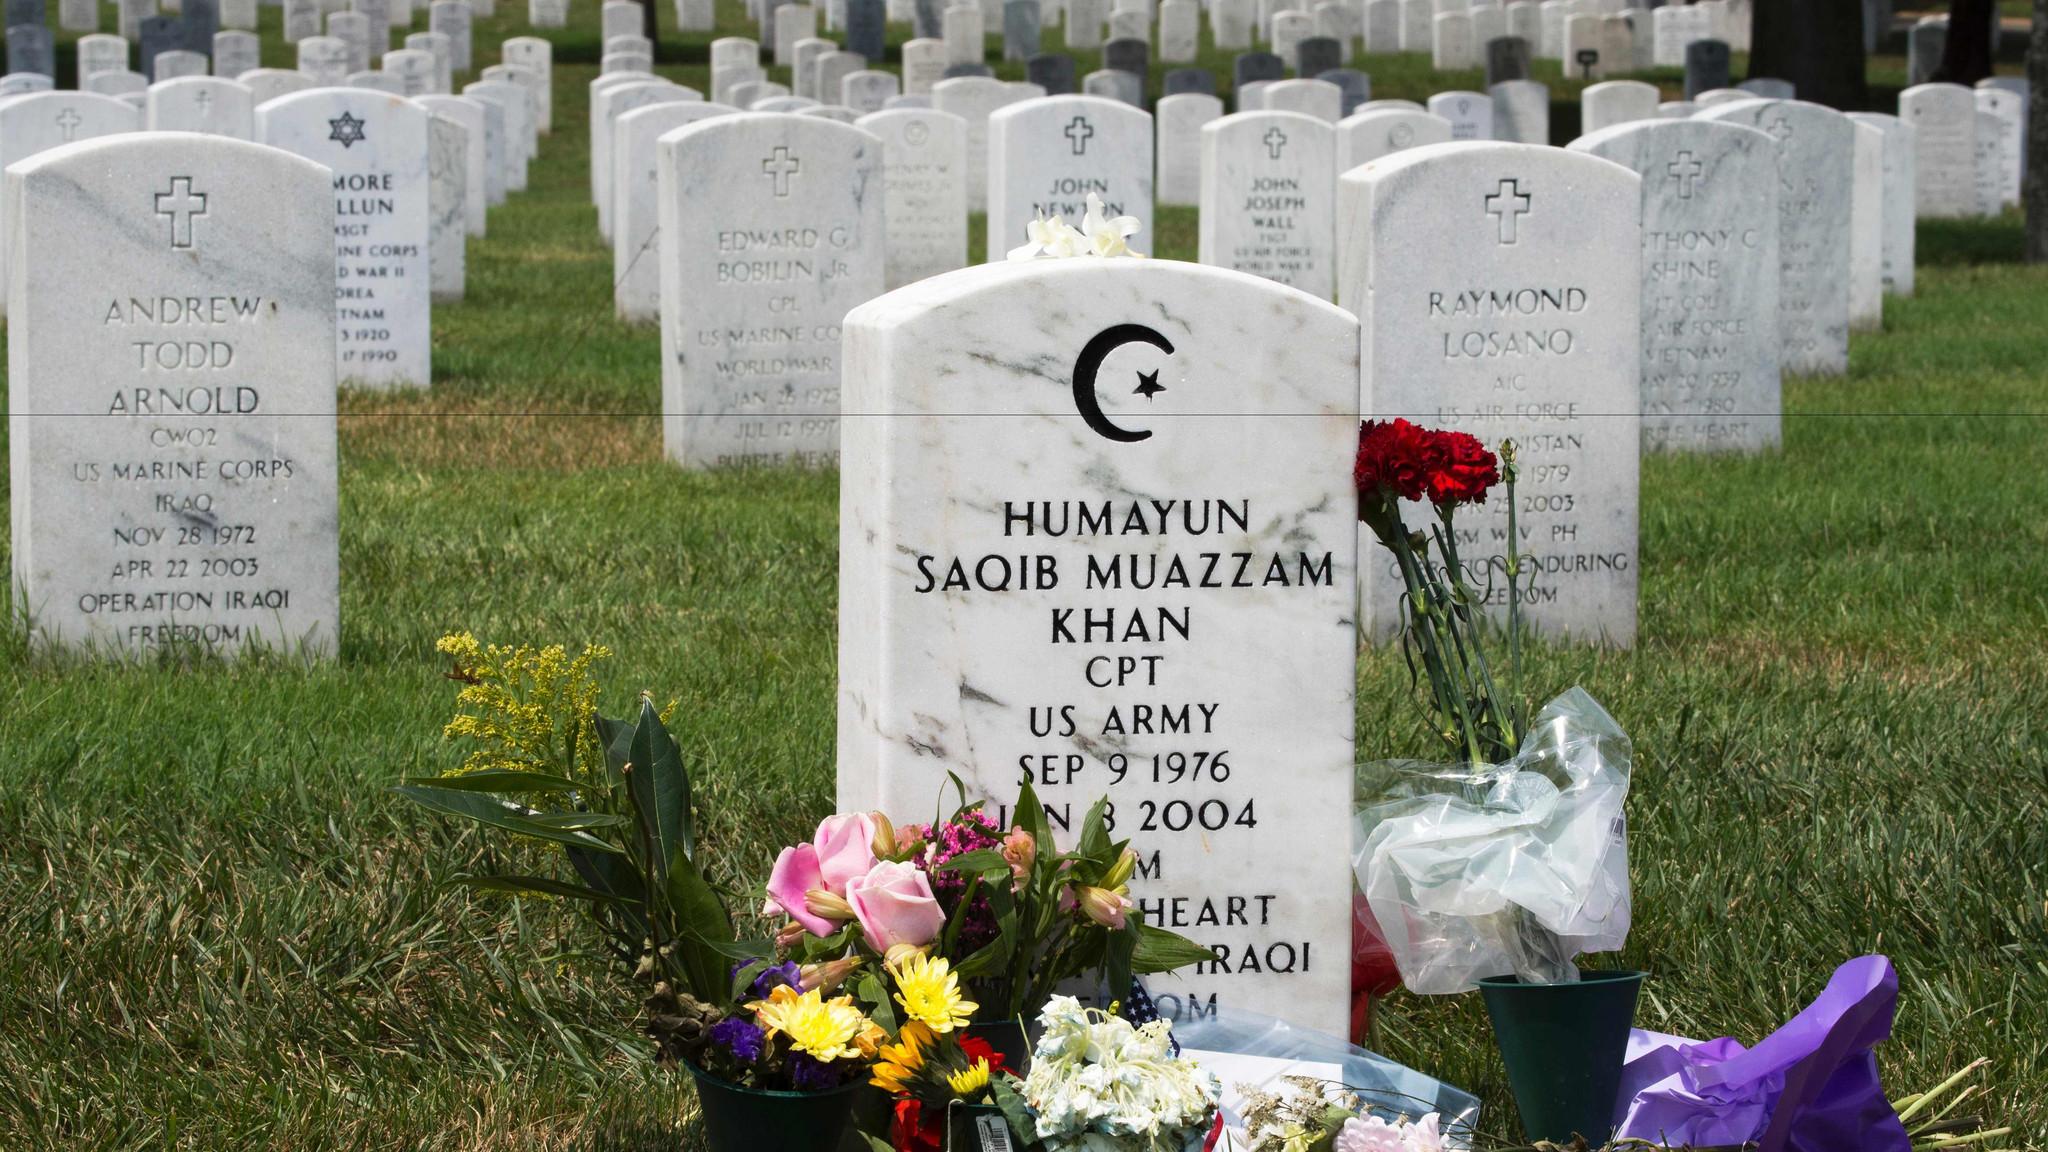 Capt. Humayun Khan is buried at Arlington National Cemetery.